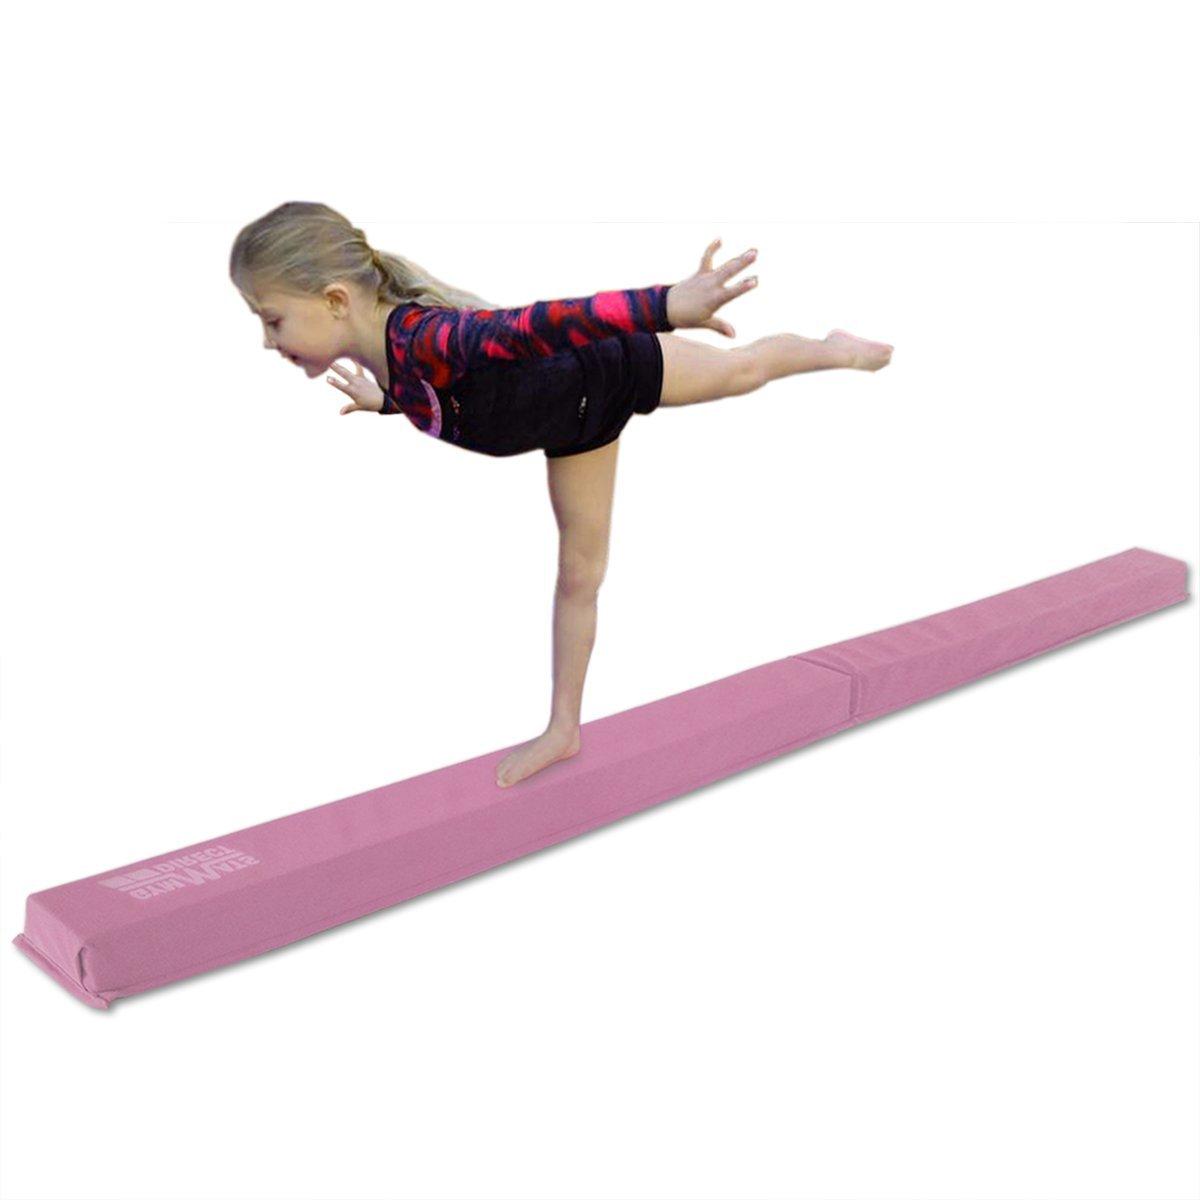 c1c10fb25e29 Get Quotations · gymmatsdirect Gymnastics Balance Beam, 8' or 9' Long  Folding Floor Balance Beams for